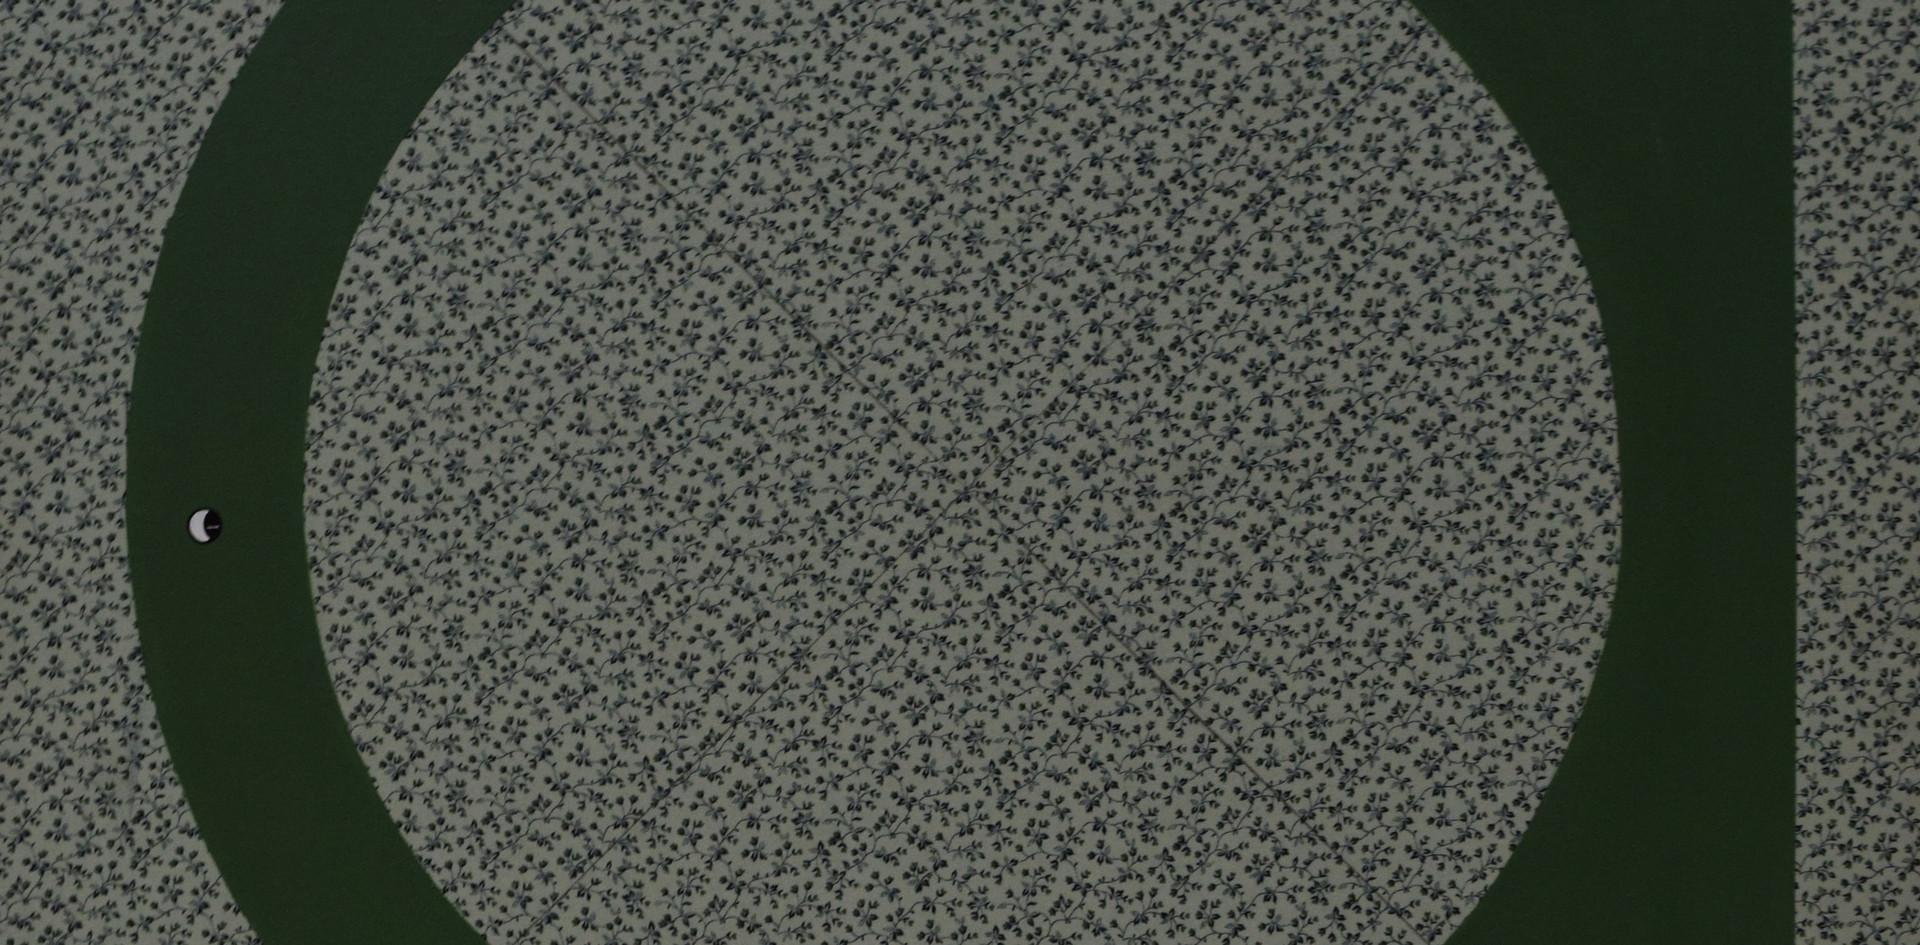 CACR033.jpg